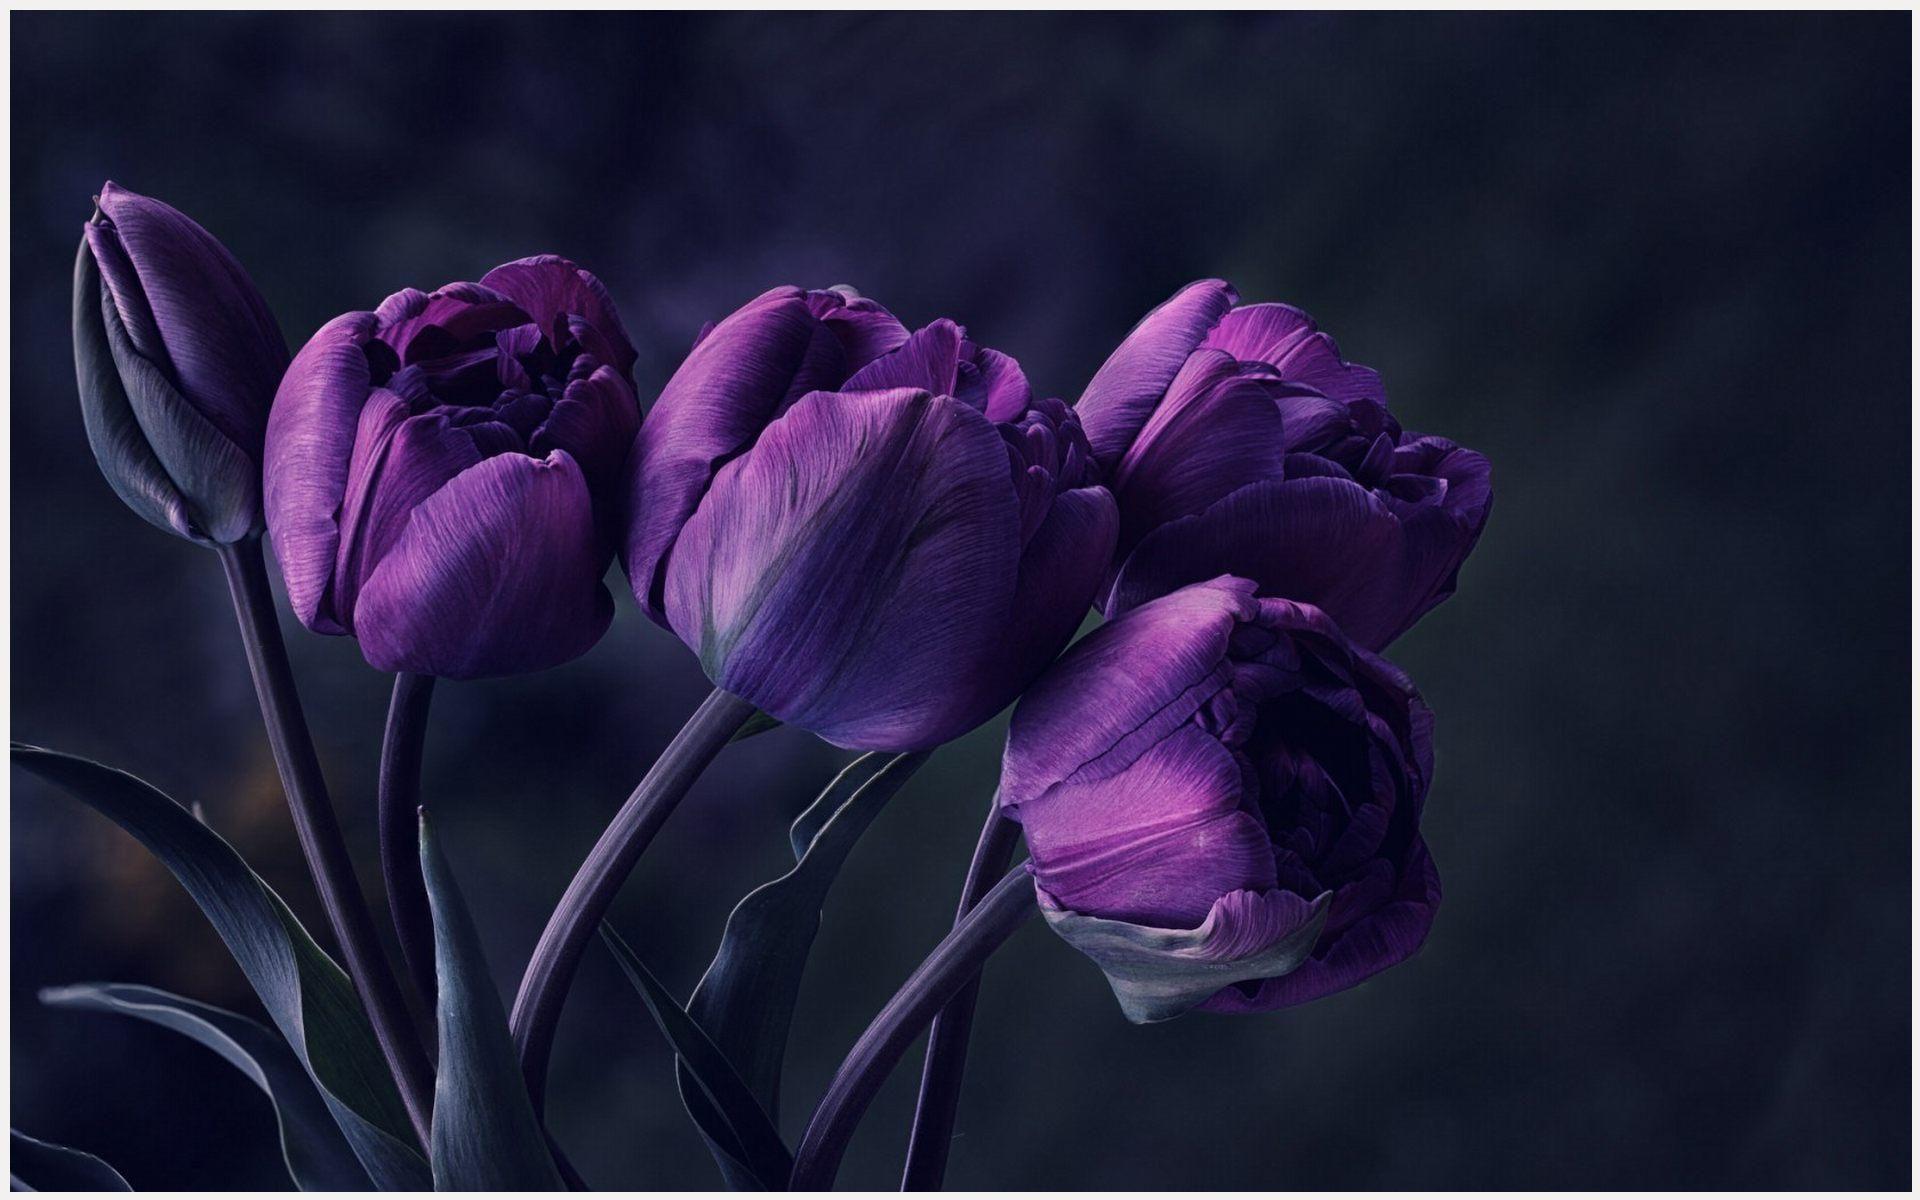 Dark purple tulip flower wallpaper decocurbs amazing funny dark purple tulip flower wallpaper decocurbs amazing funny wallpaper dark purple tulip flower wallpaper decocurbs amazing funny wallpaper mightylinksfo